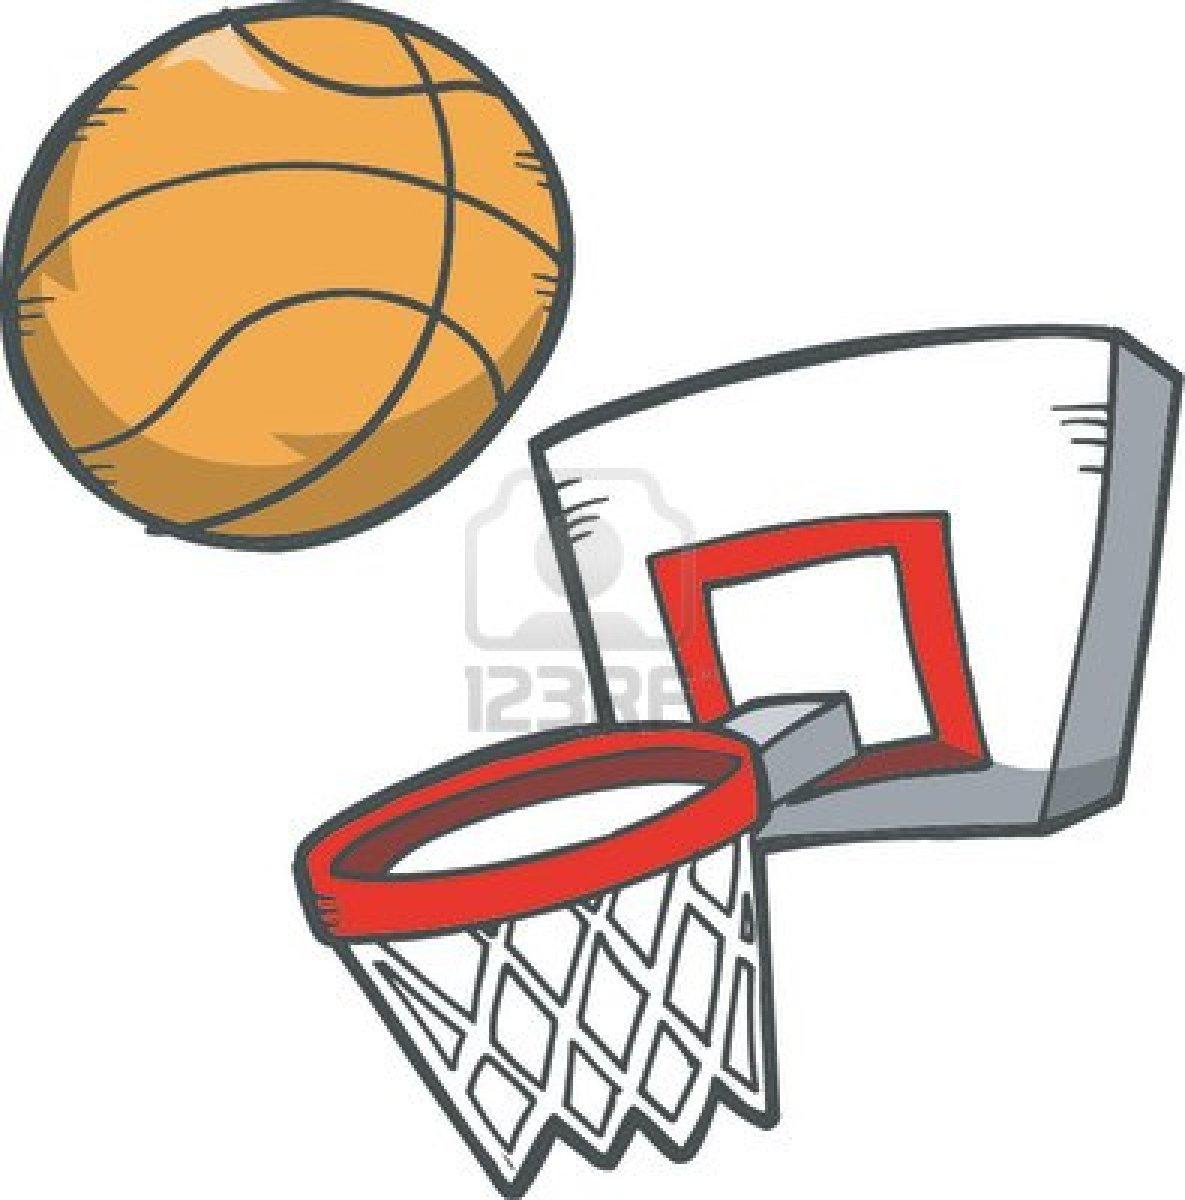 Basketball Rim Clip Art